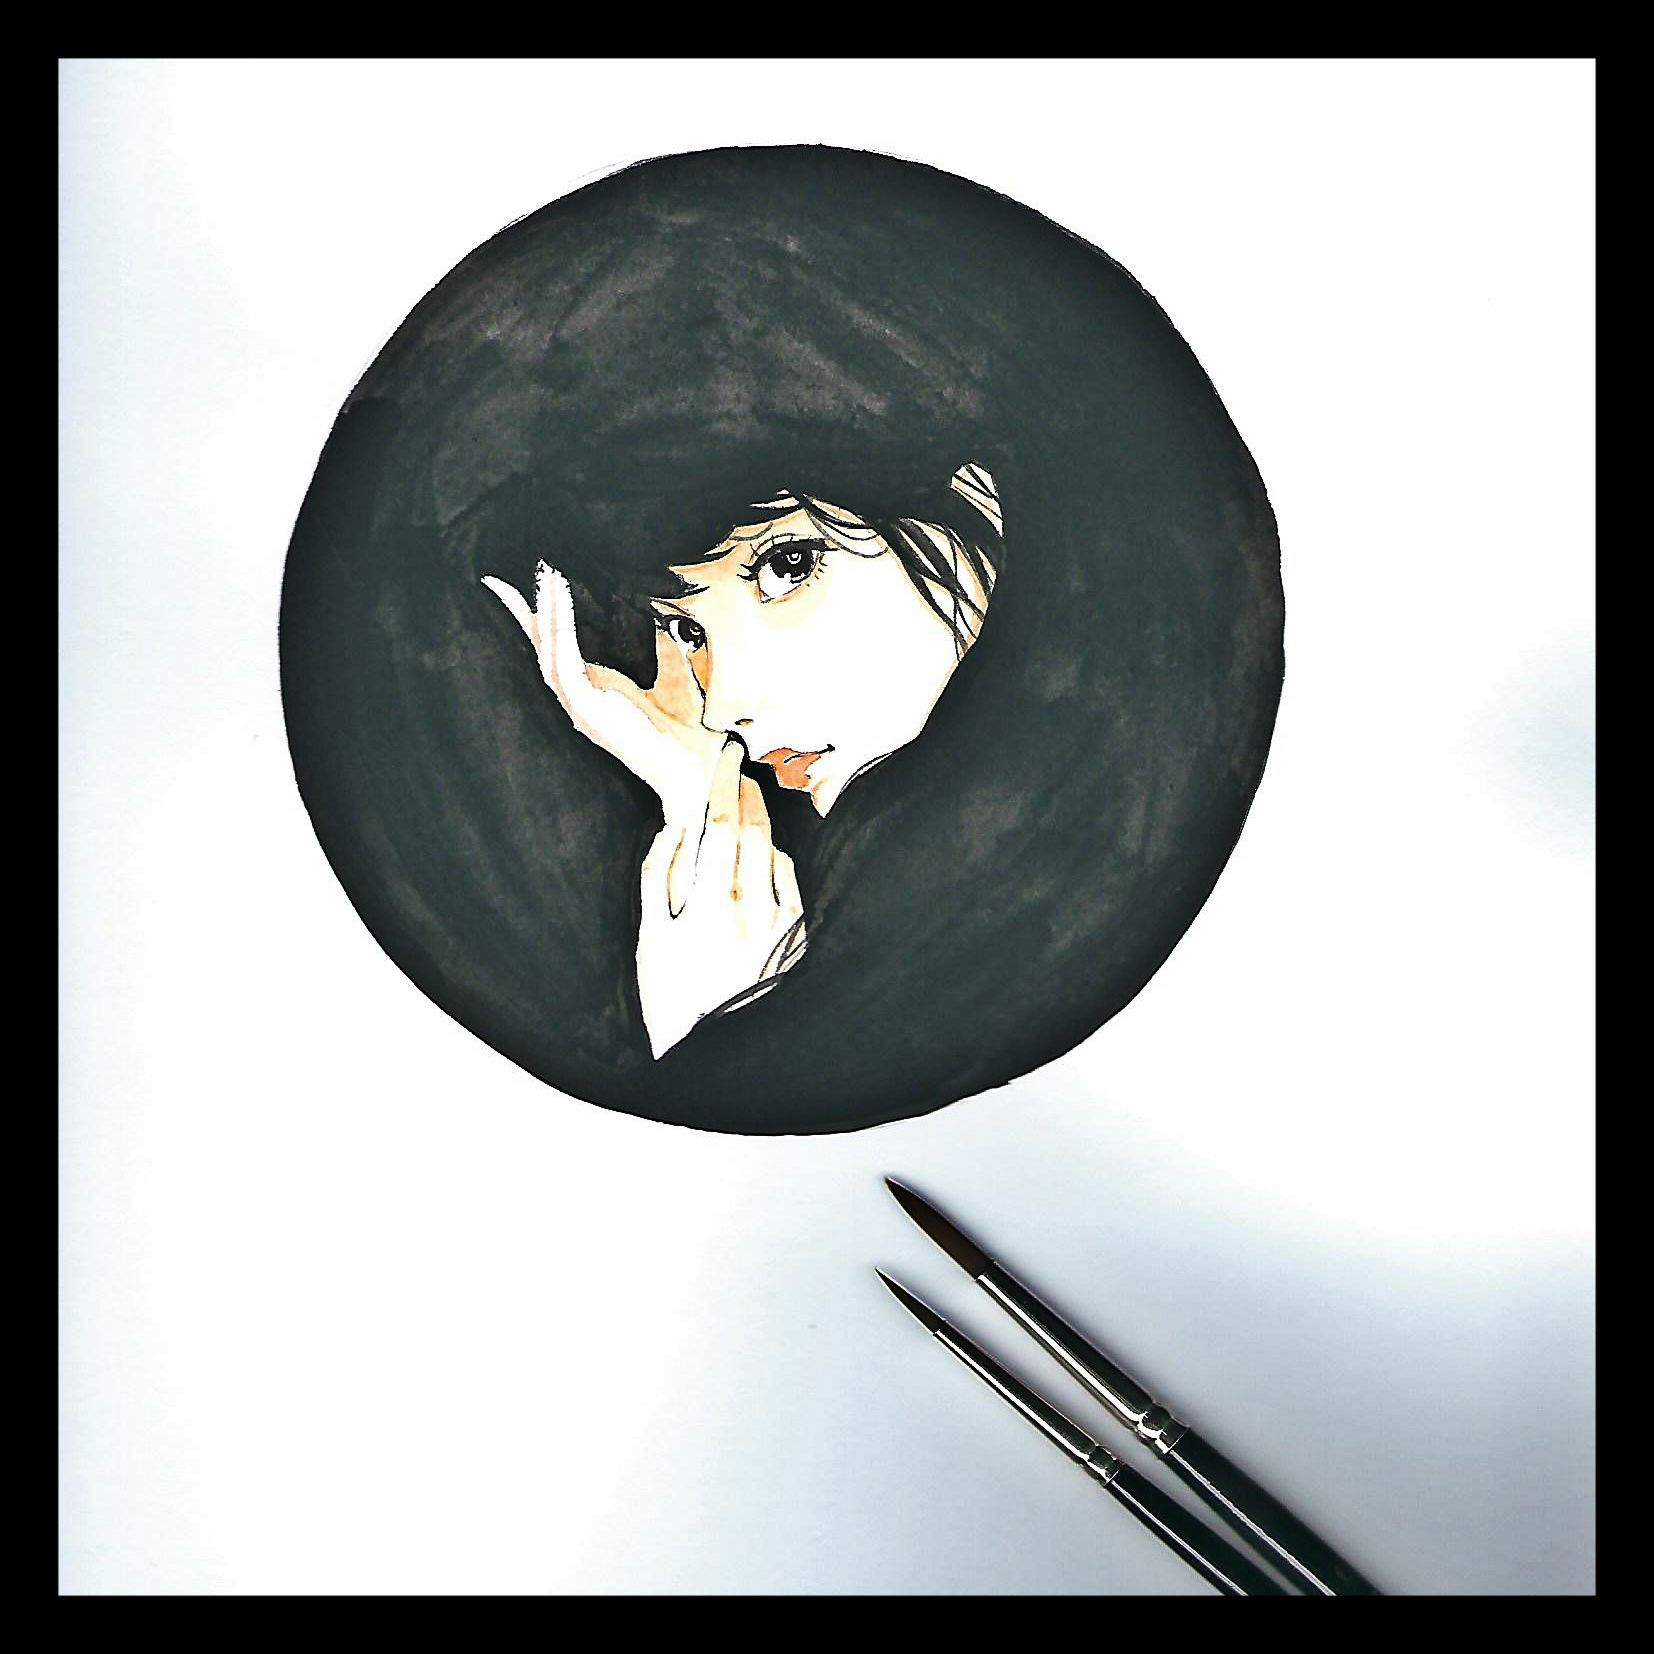 Dibujos Con Fondo Negro